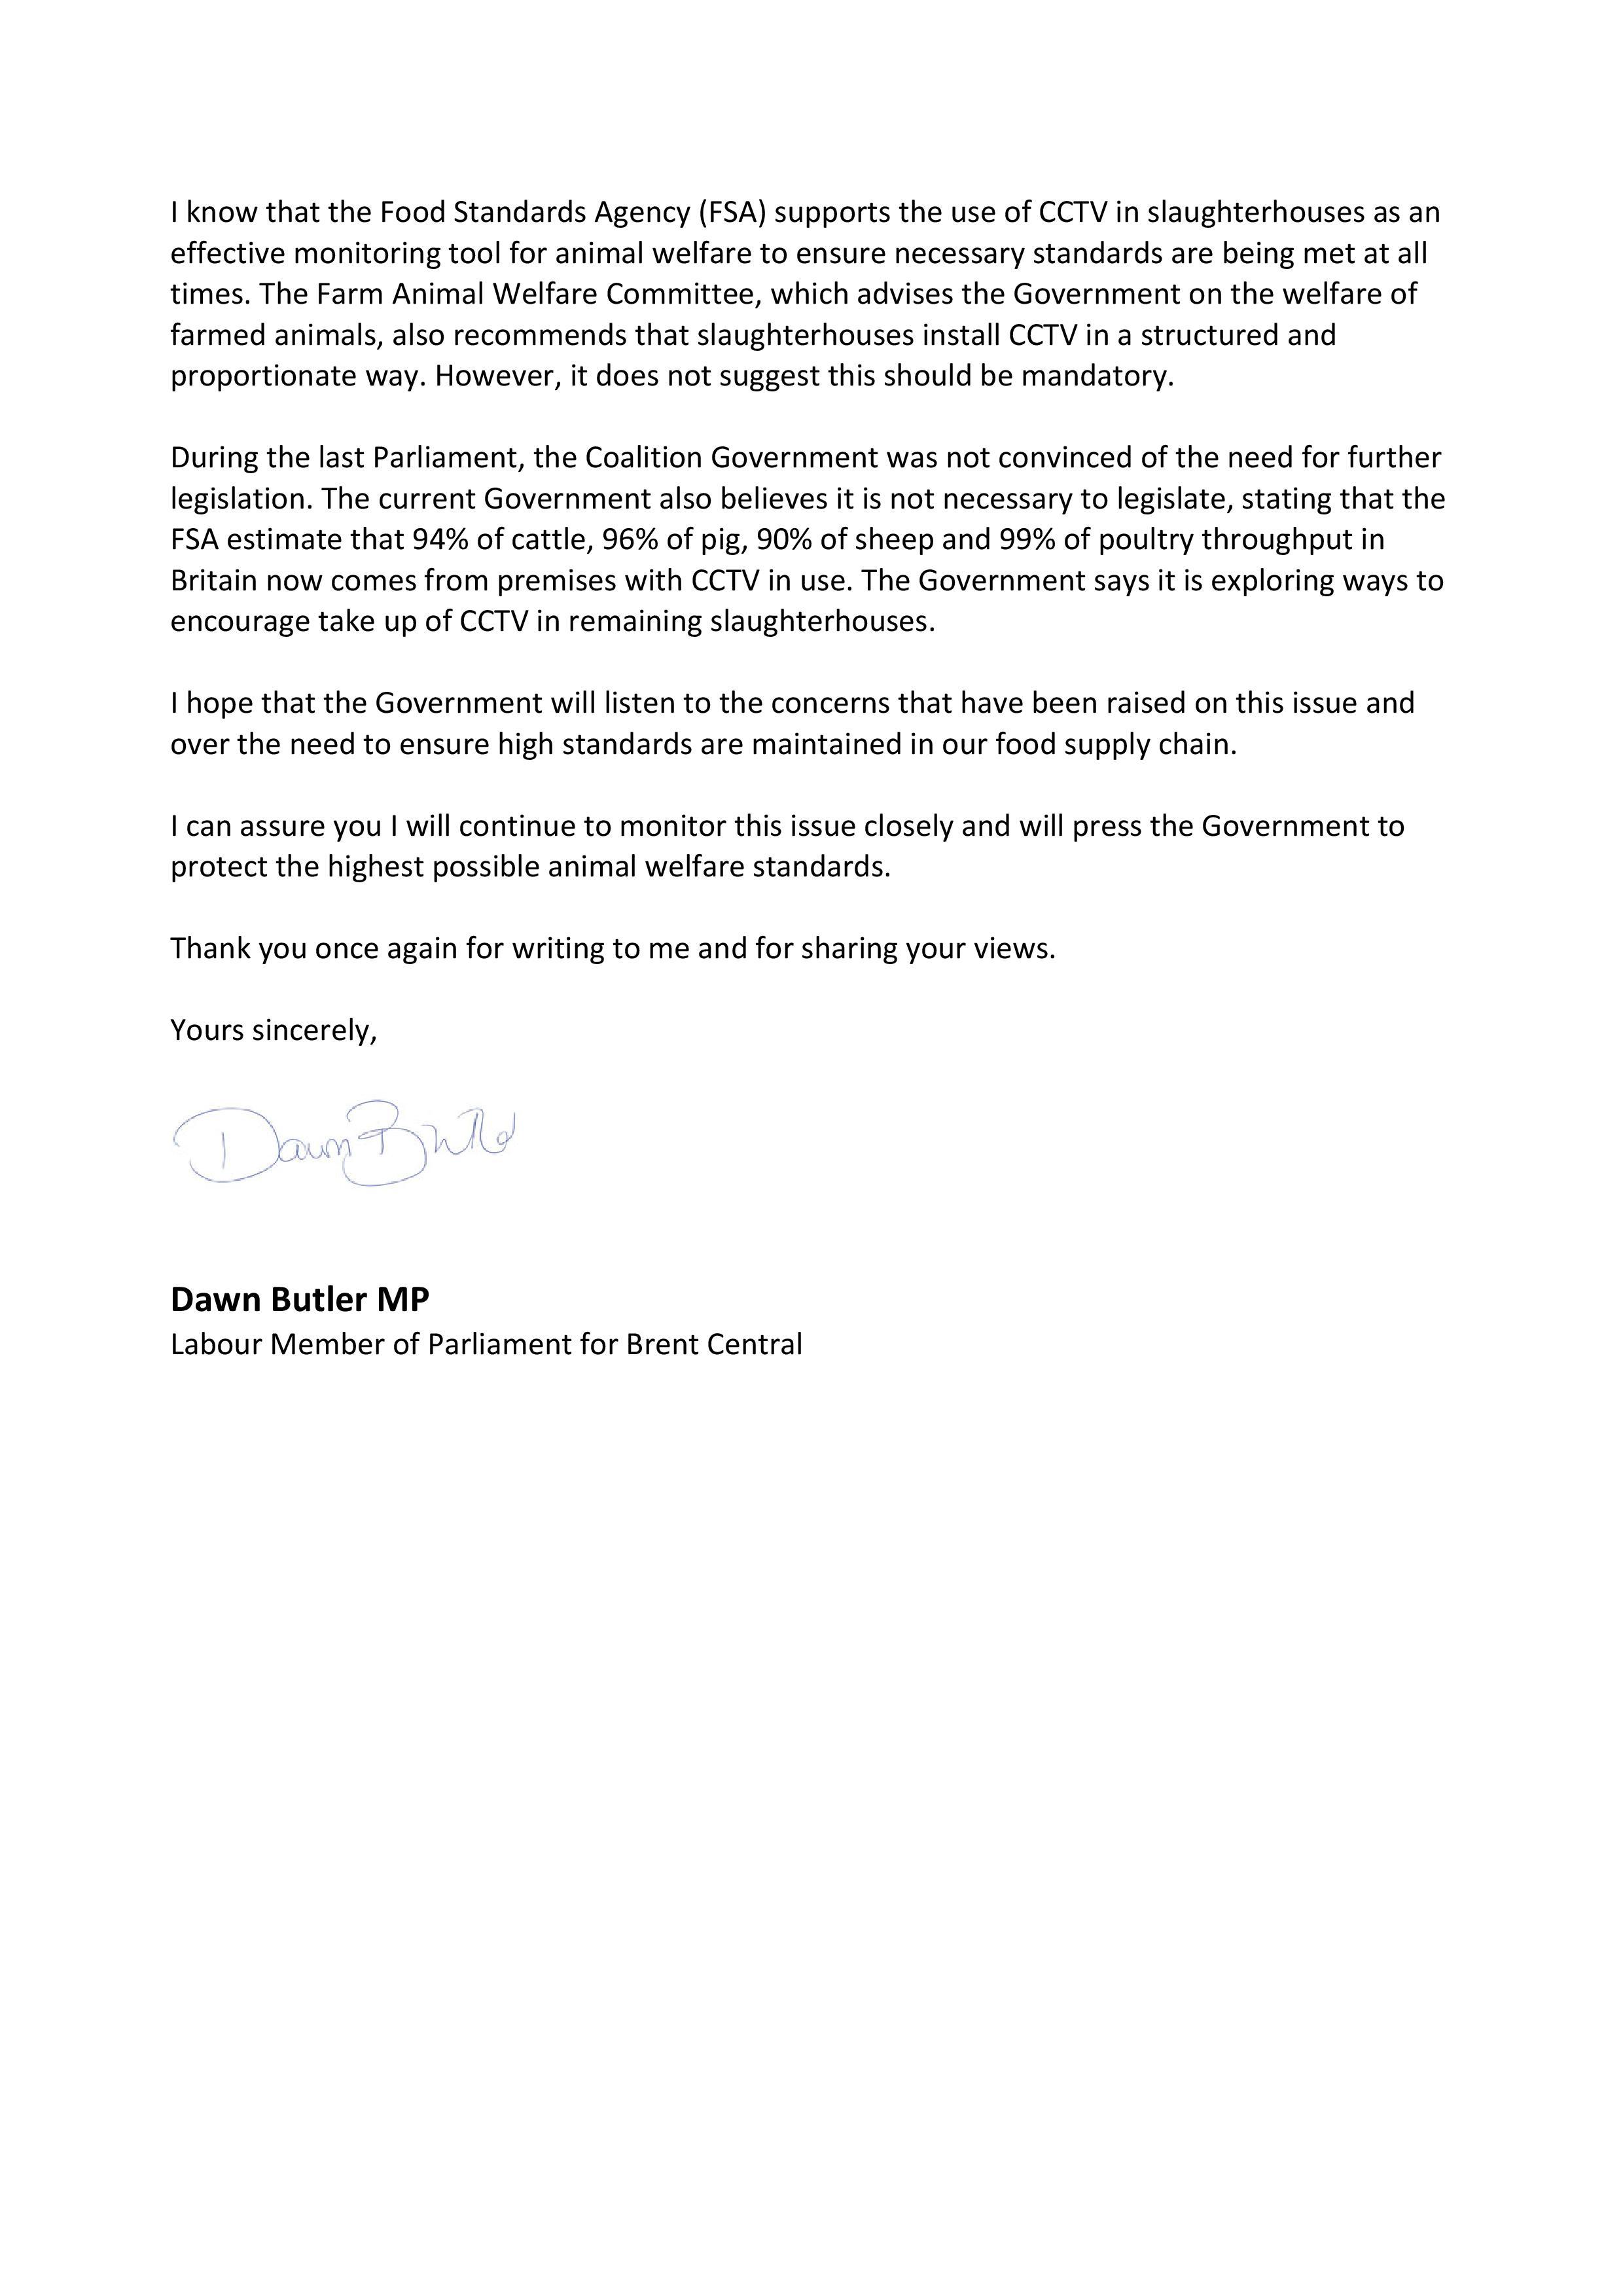 CCTV_in_slaughterhouses_letter-page-002.jpg